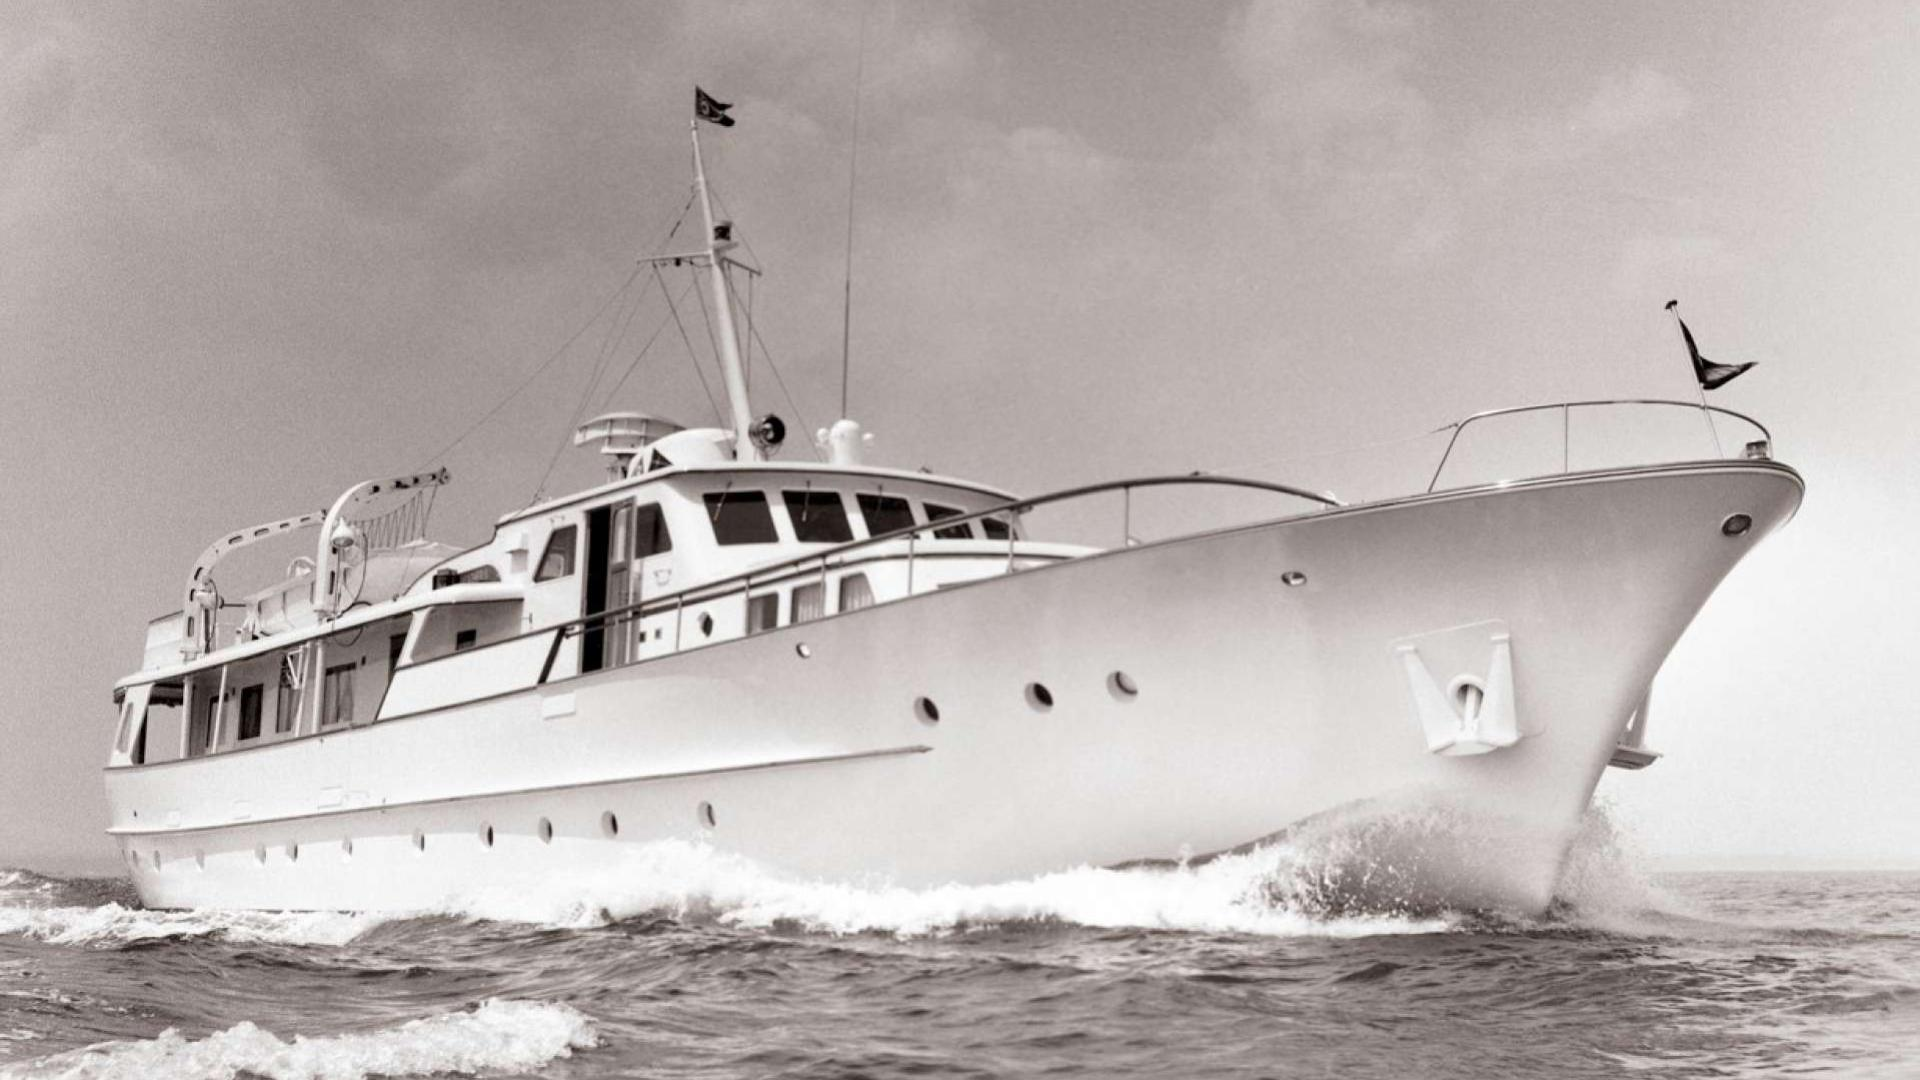 coral-ii-motor-yacht-feadship-1963-33m-cruising